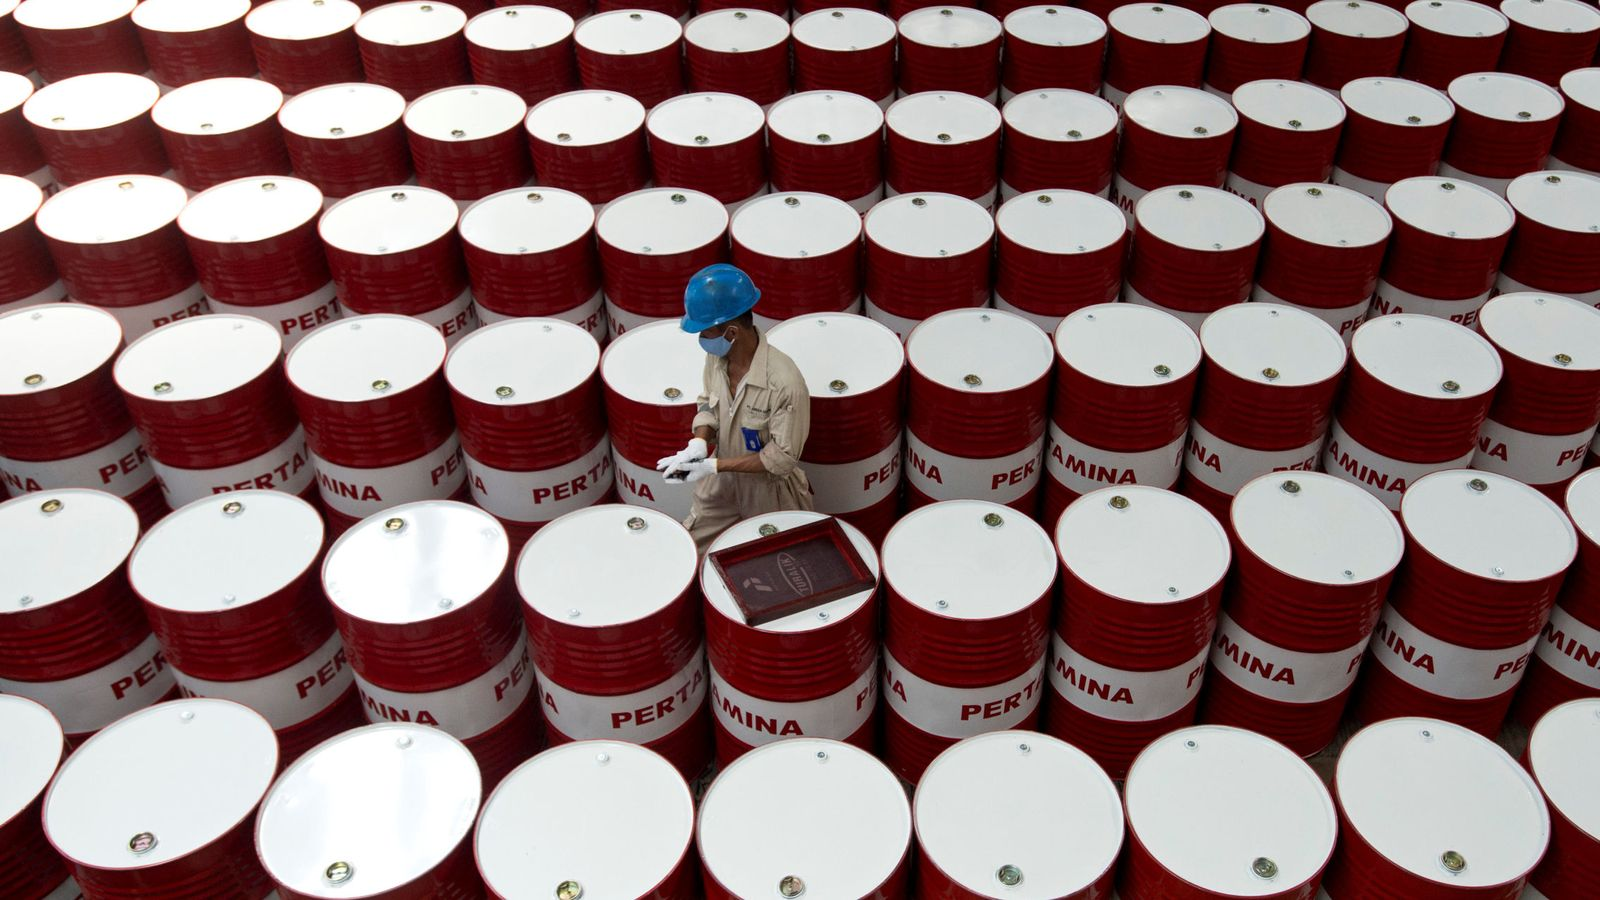 Foto: Trabajador entre barriles de petróleo. (Rueters)